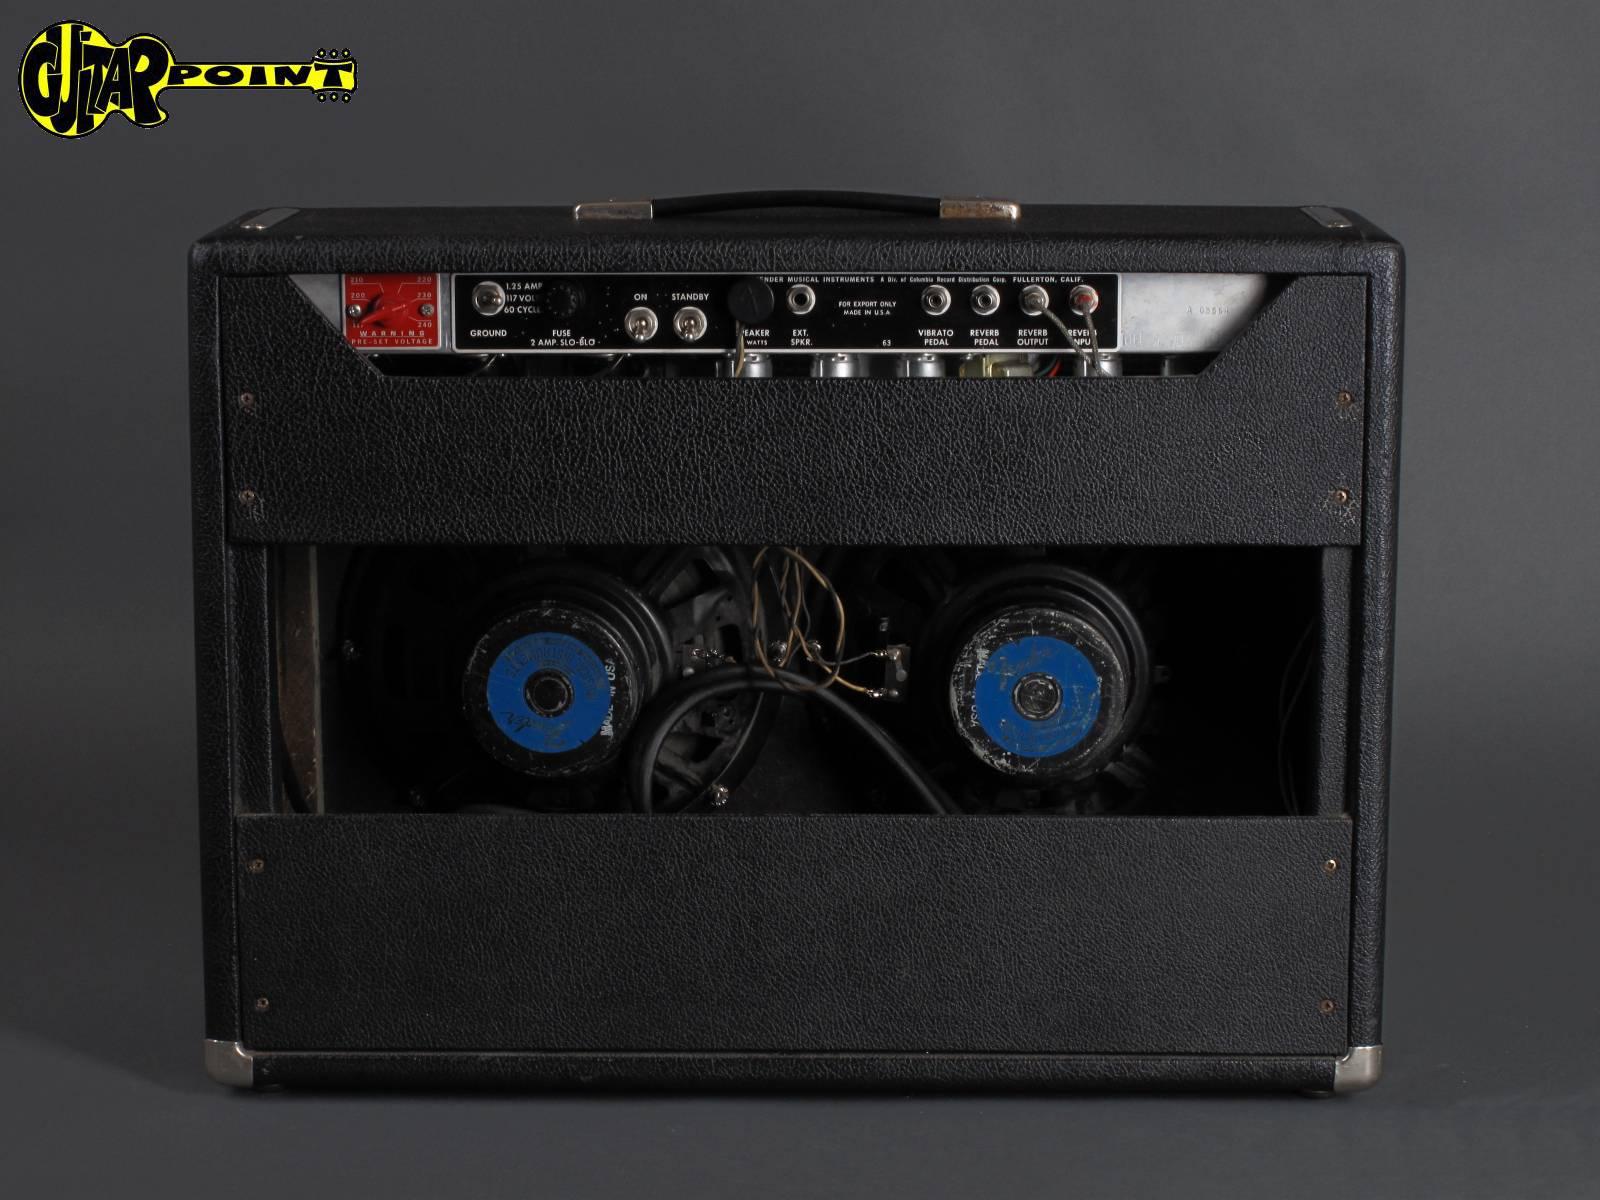 1967 fender vibrolux reverb amp blackface vi67fevibroluxreva08664. Black Bedroom Furniture Sets. Home Design Ideas